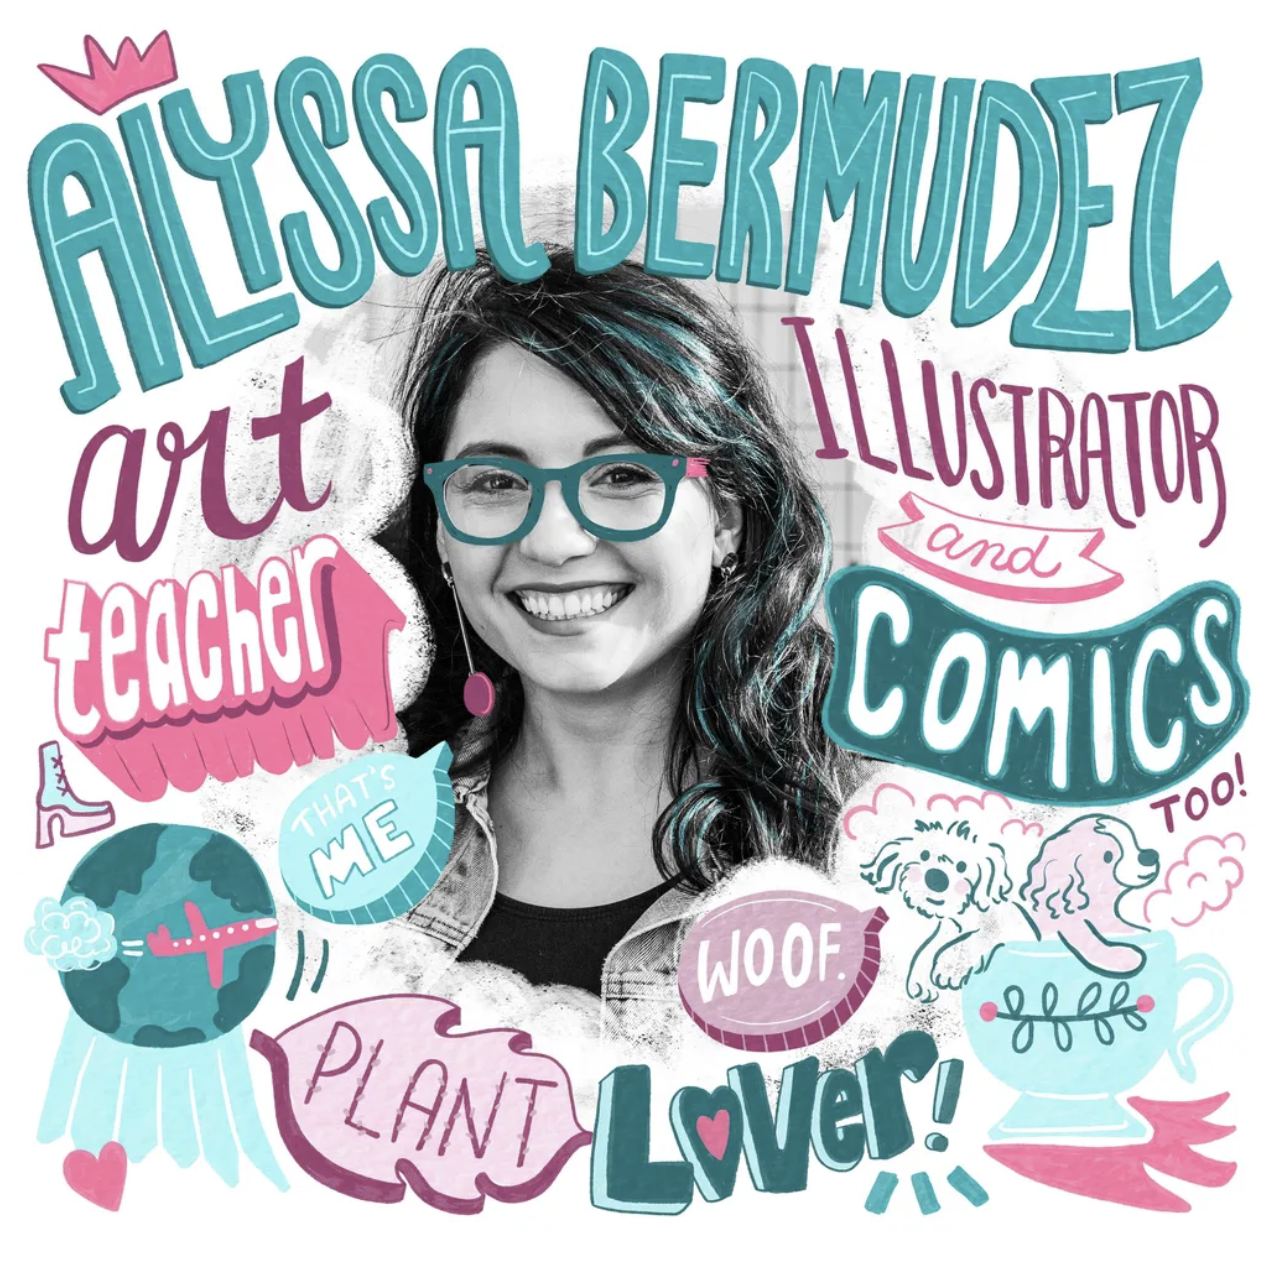 alyssa bermudez poster